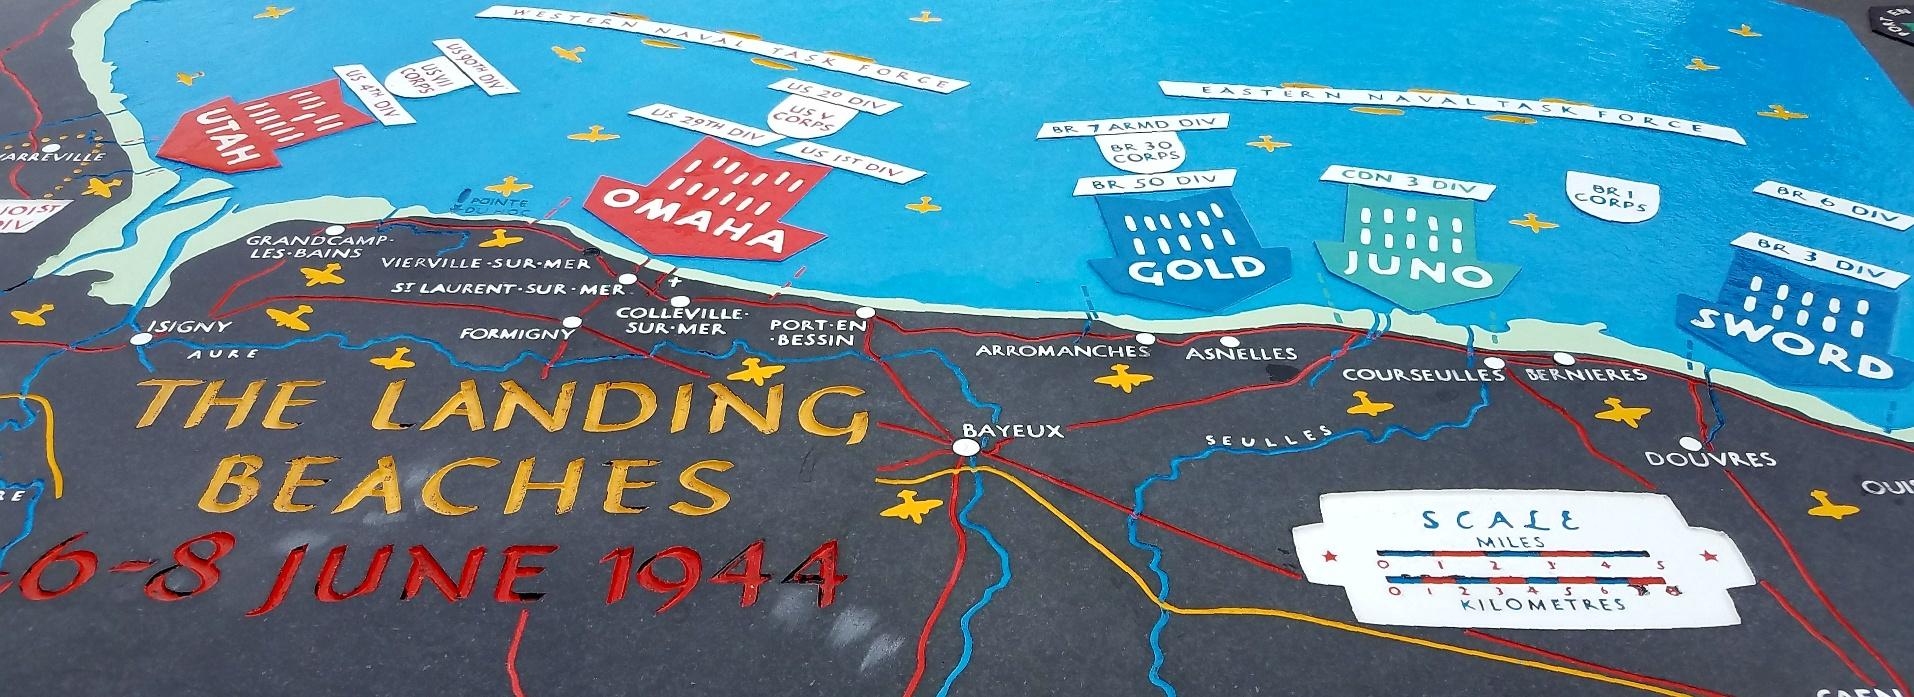 WWII Normandy Invasion Tour Part 1 – Pointe du Hoc, Normandy